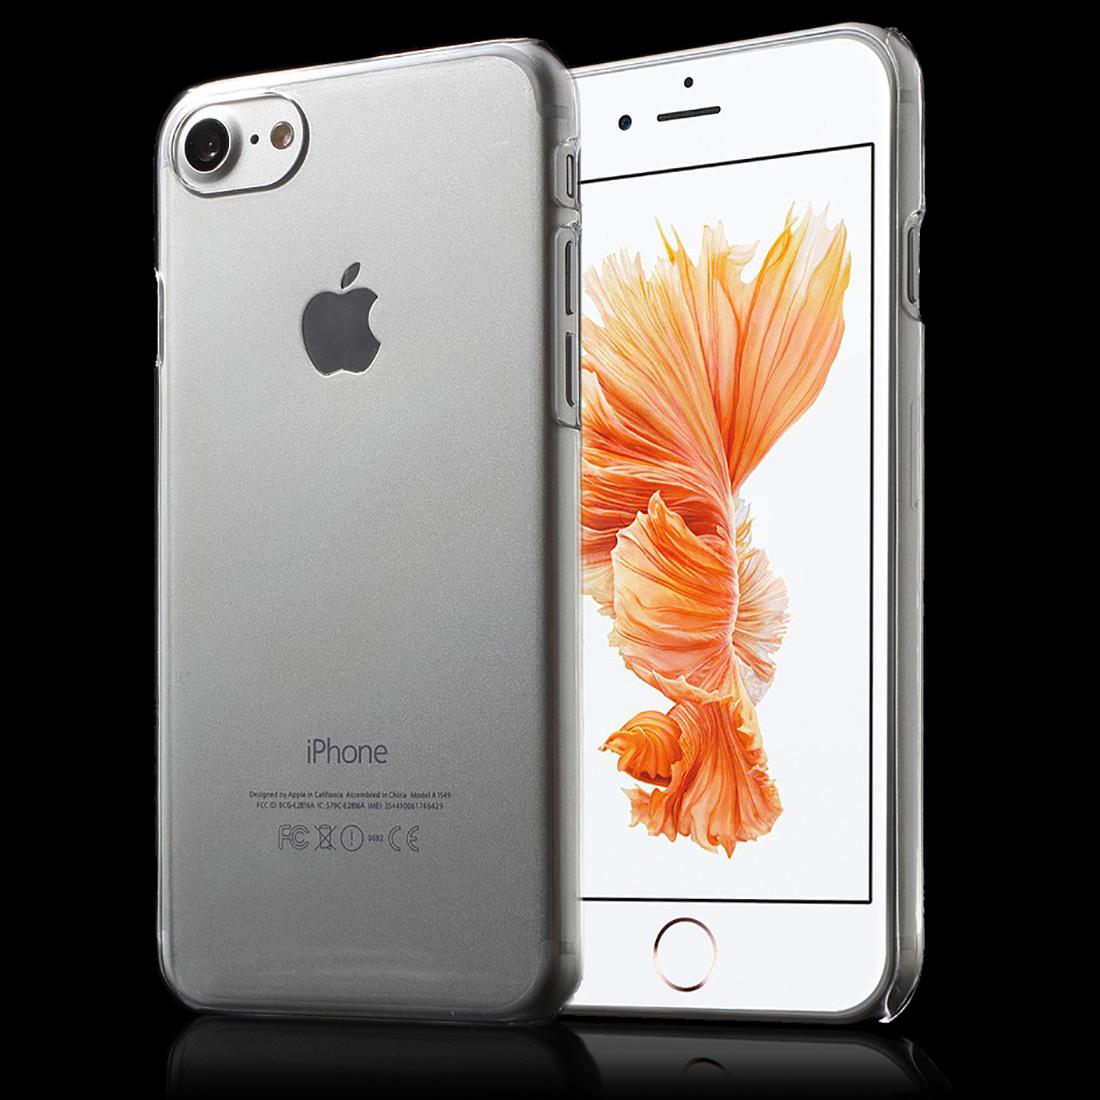 apple iphone 7 und iphone 8 crystal case schutz h lle. Black Bedroom Furniture Sets. Home Design Ideas